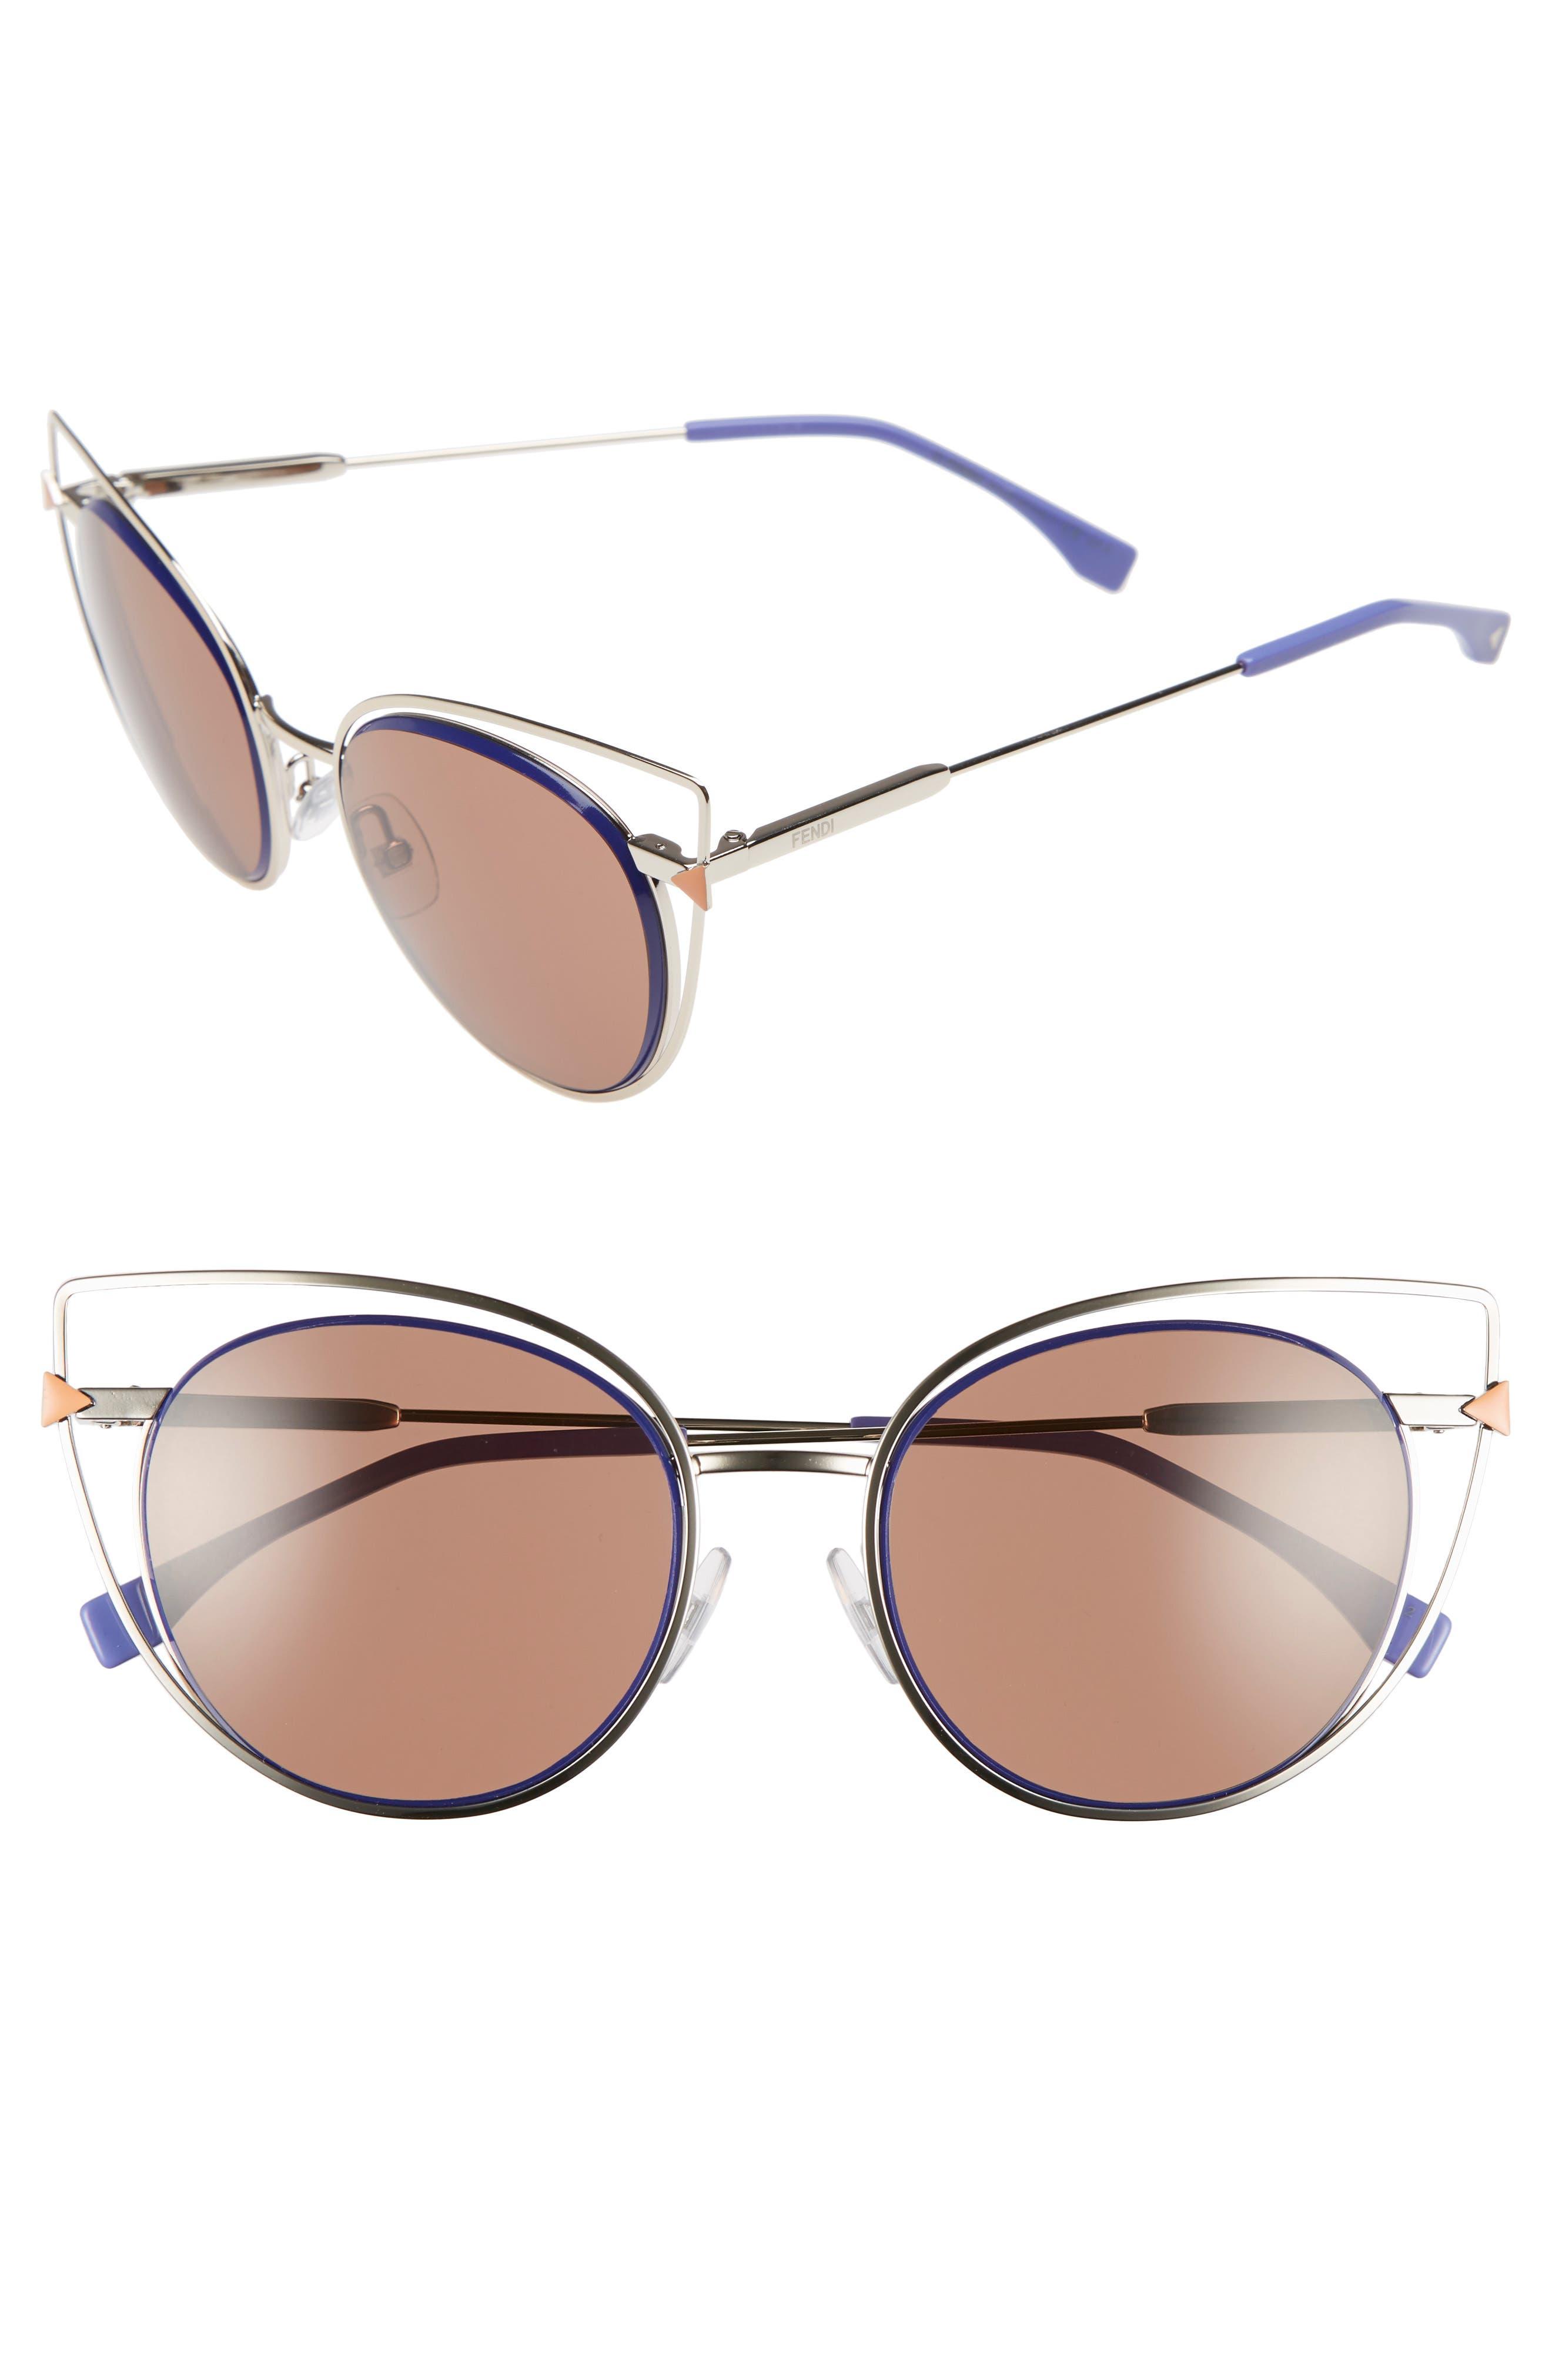 53mm Sunglasses,                             Alternate thumbnail 12, color,